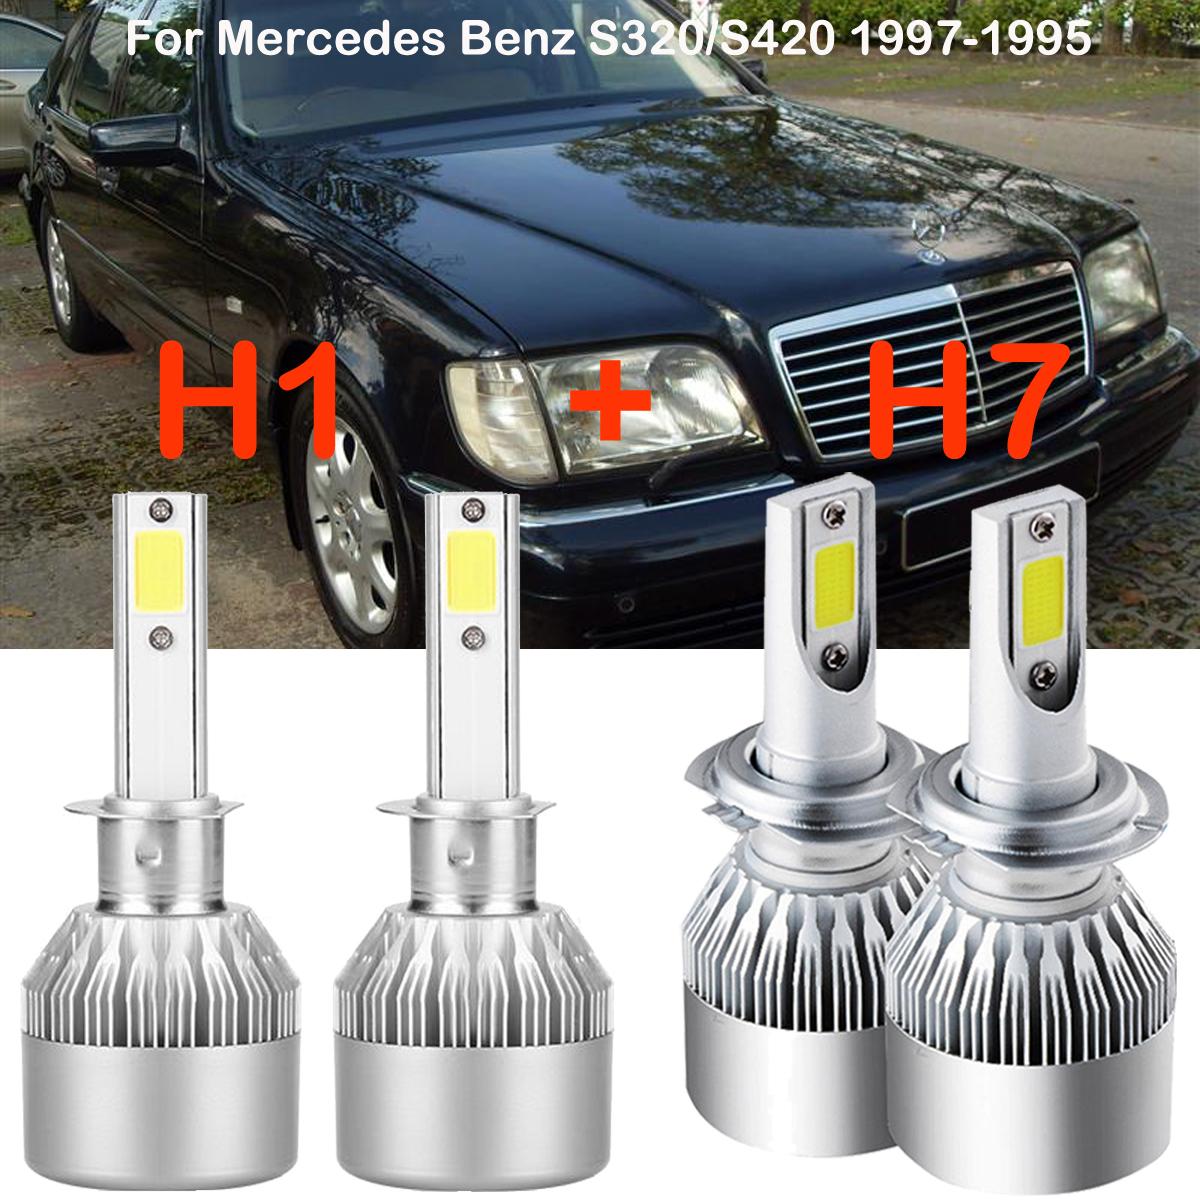 H1 H7 LED Headlight Kits Bulbs For Mercedes-Benz S320/S420 1997-1995 6000K  White